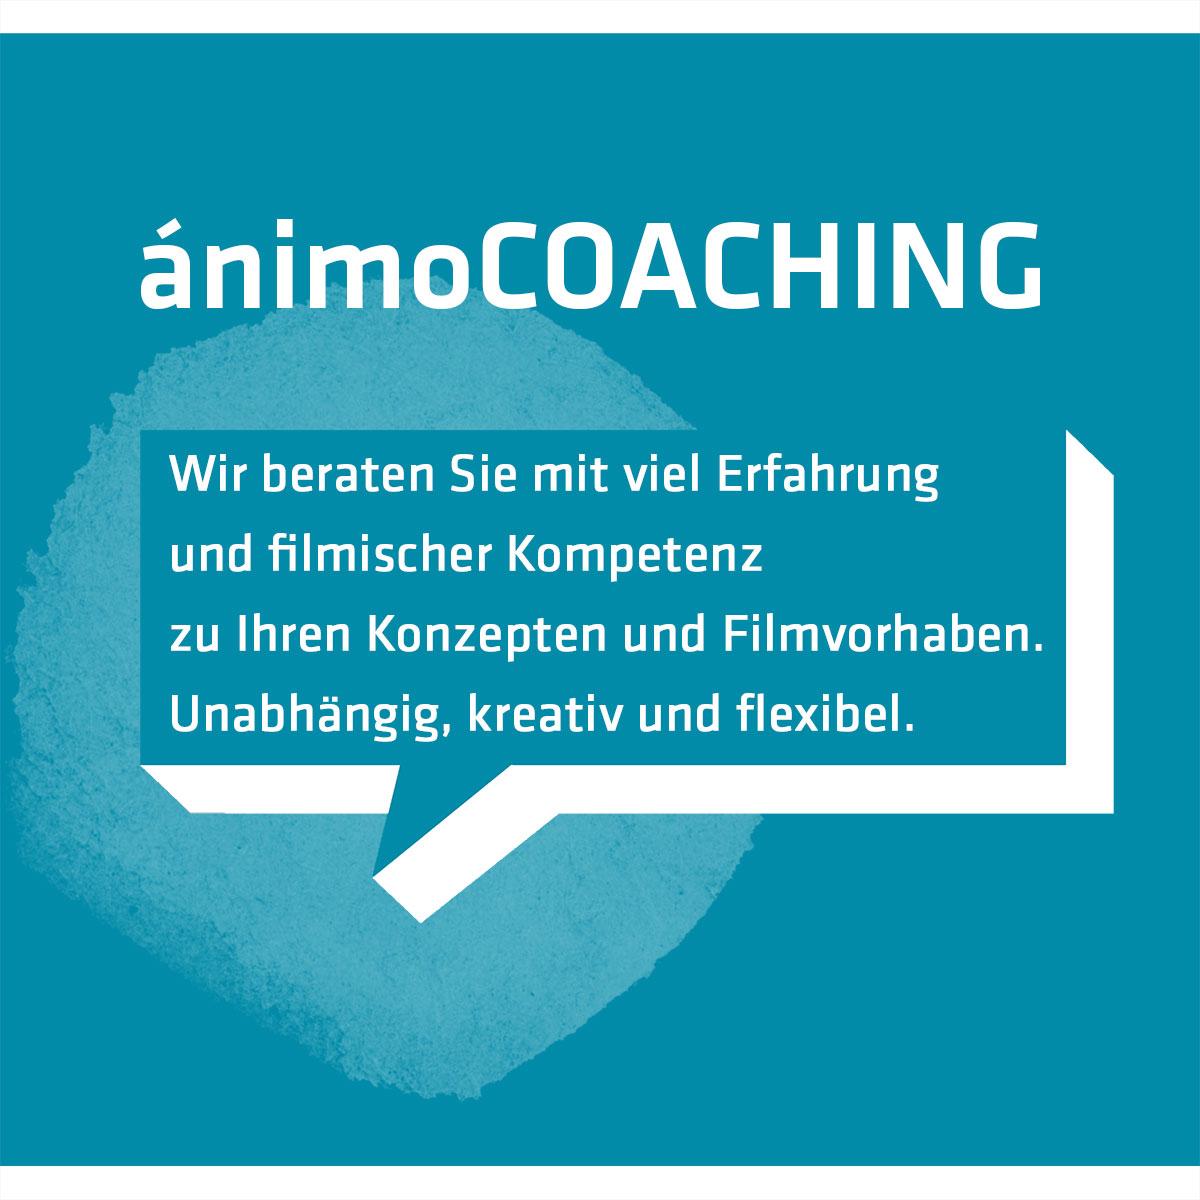 animo film coaching rand 1